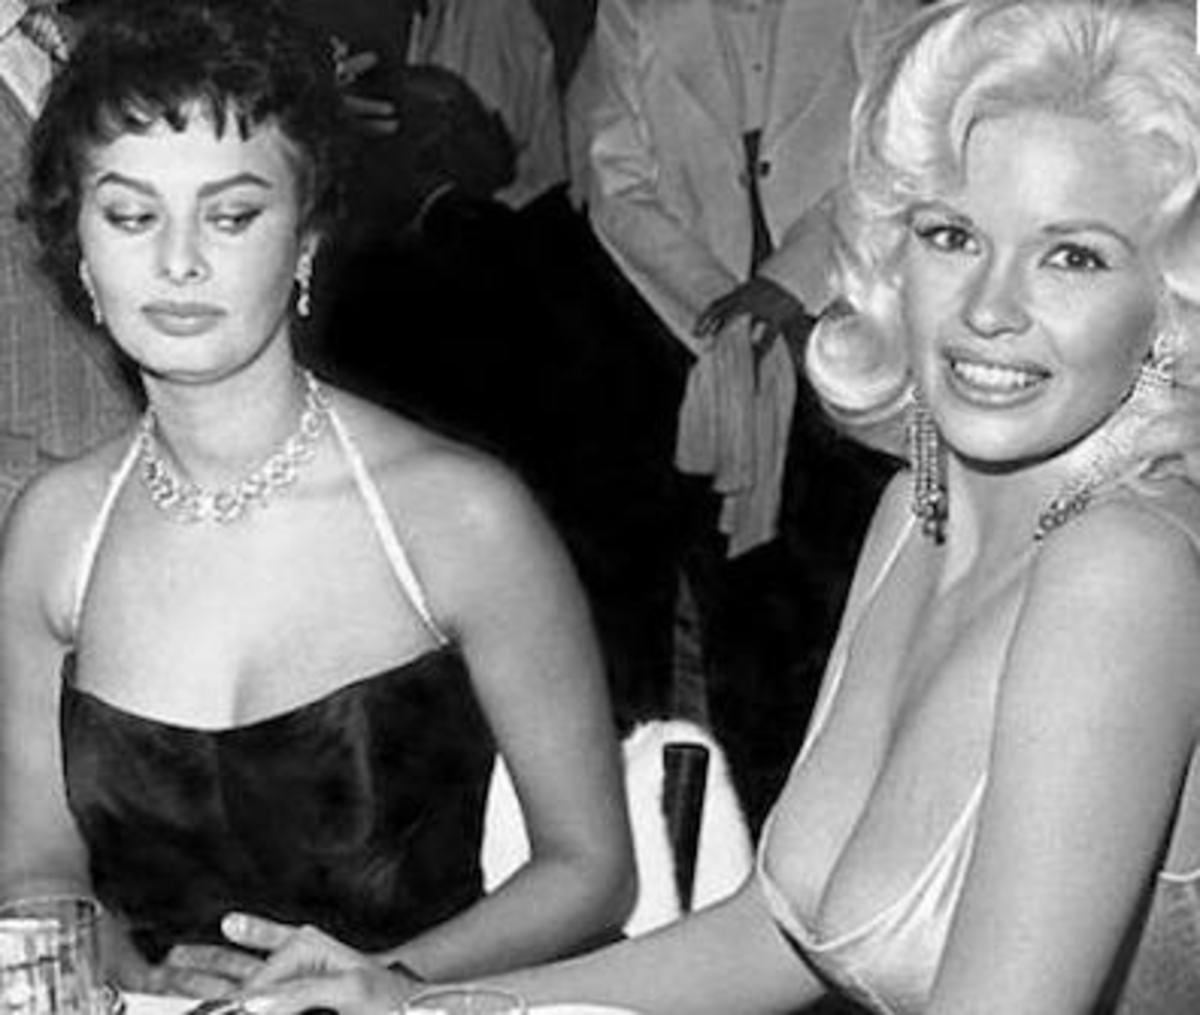 1957-Sophia Loren spies at Jayne Mansfield breasts- before implants existed.